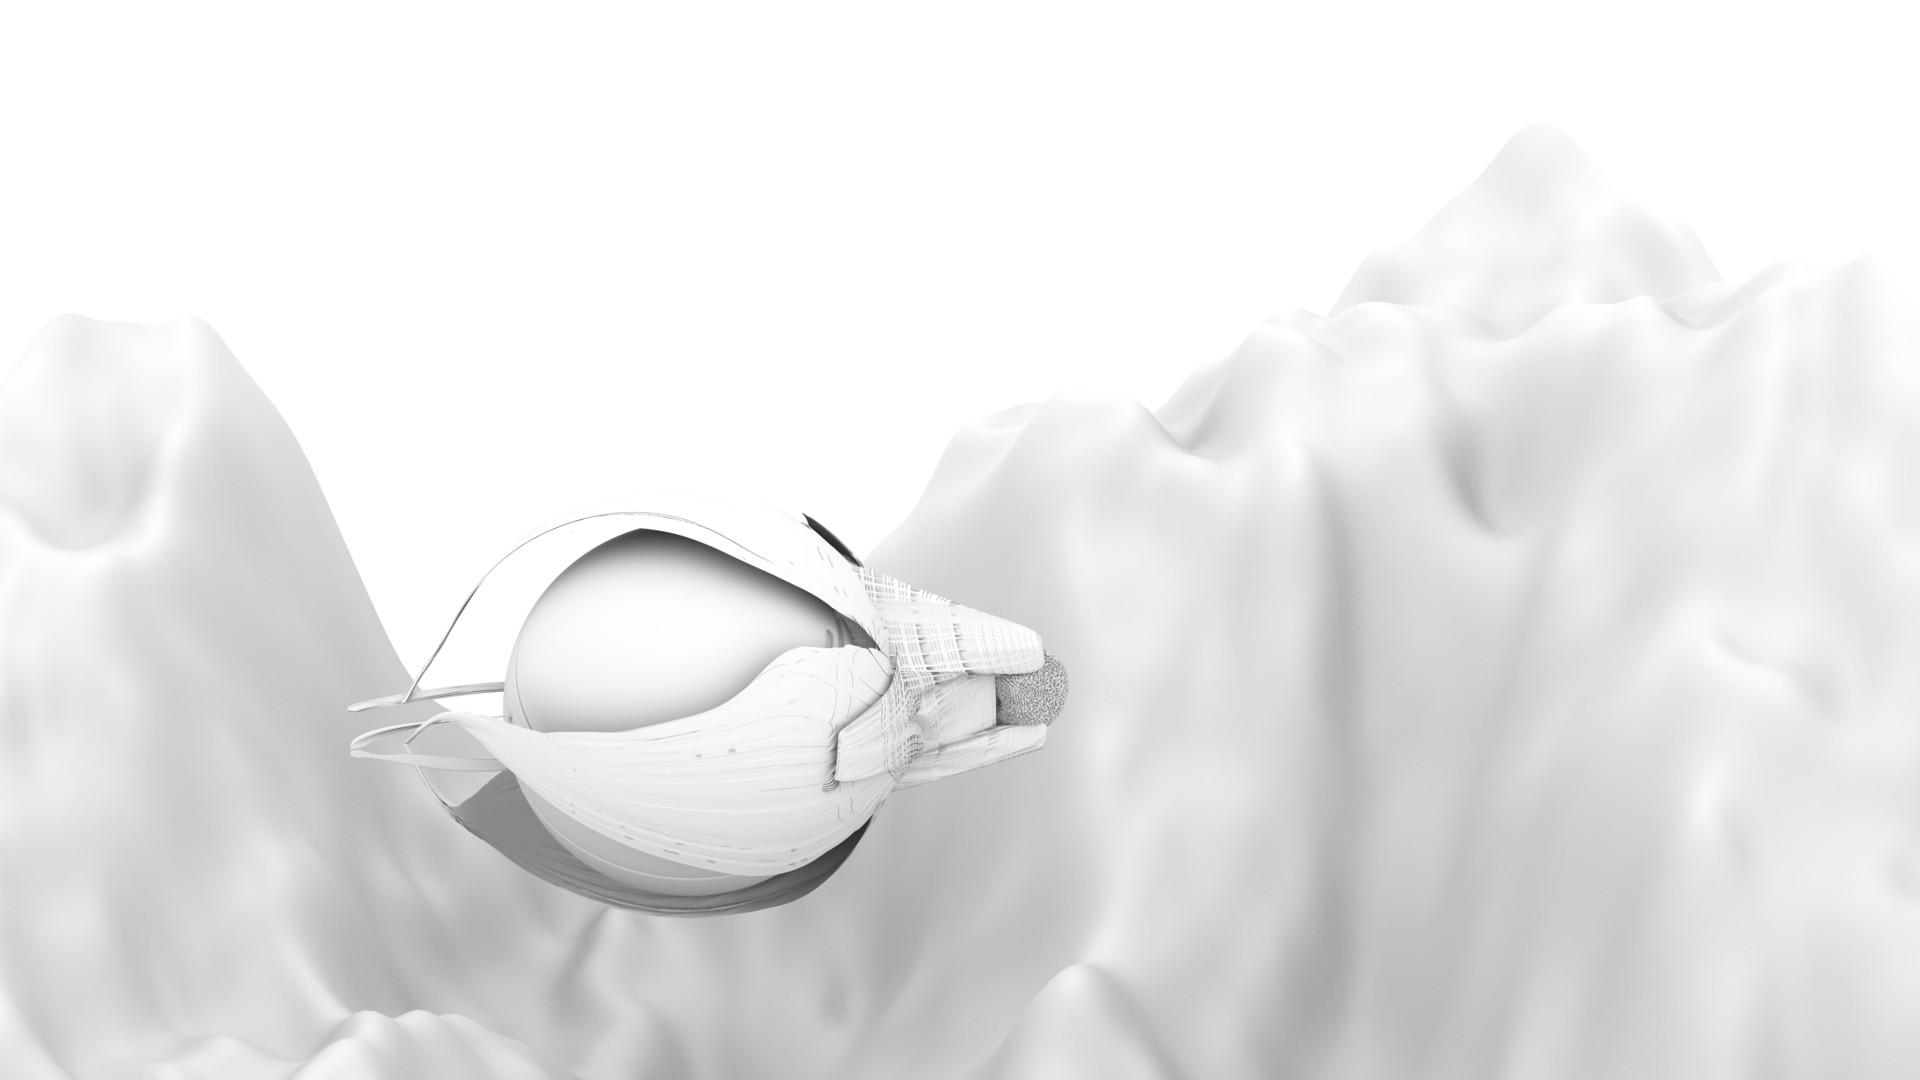 Kresimir jelusic robob3ar 259 280616 ao